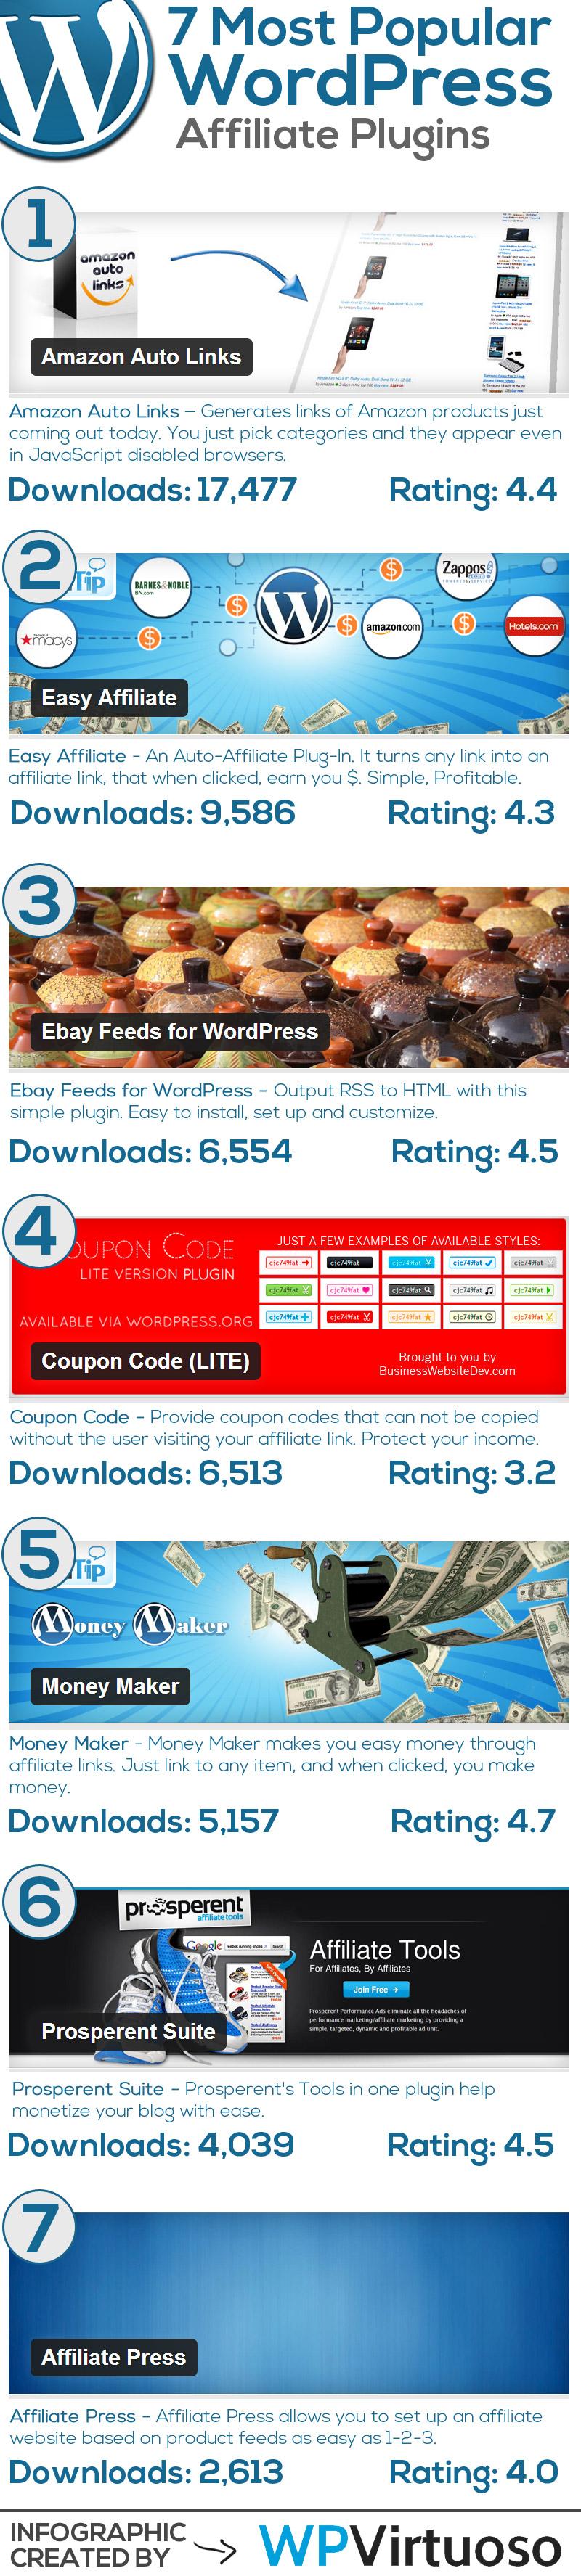 Best-Wordpress-Affiliate-Plugins-Infographic